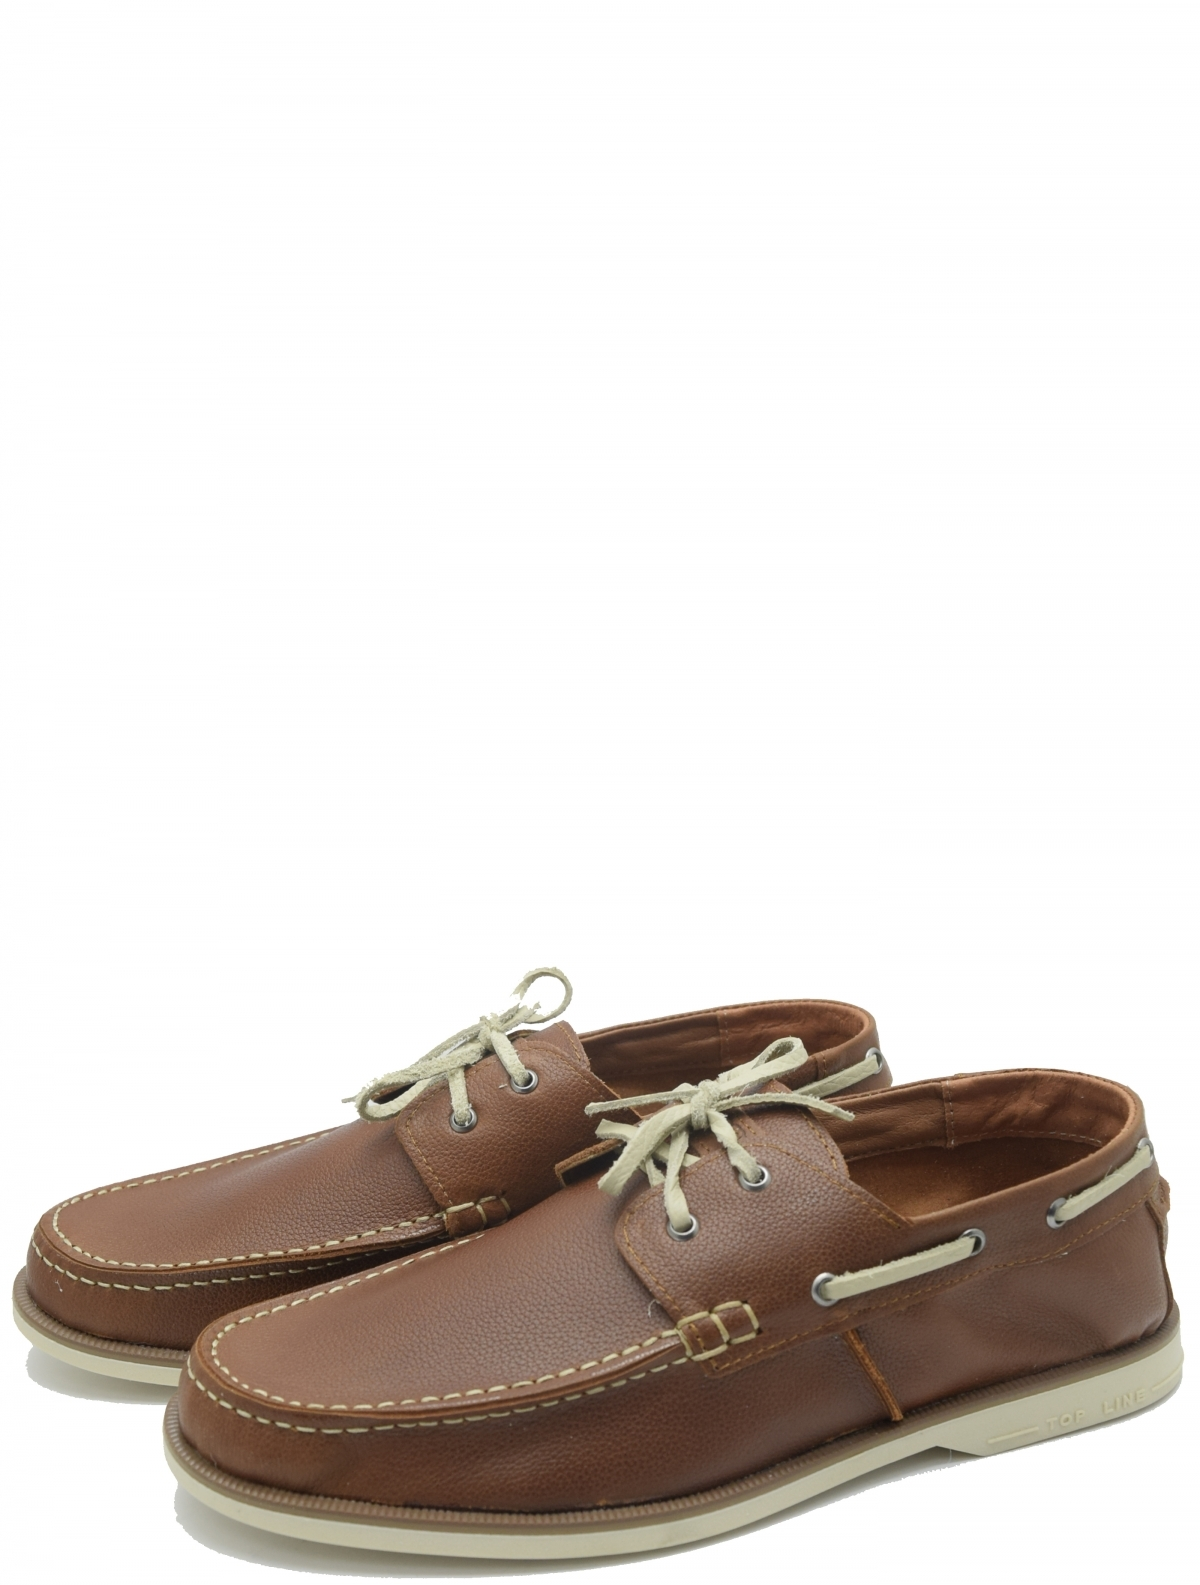 Rooman 300-111-S5C мужские туфли